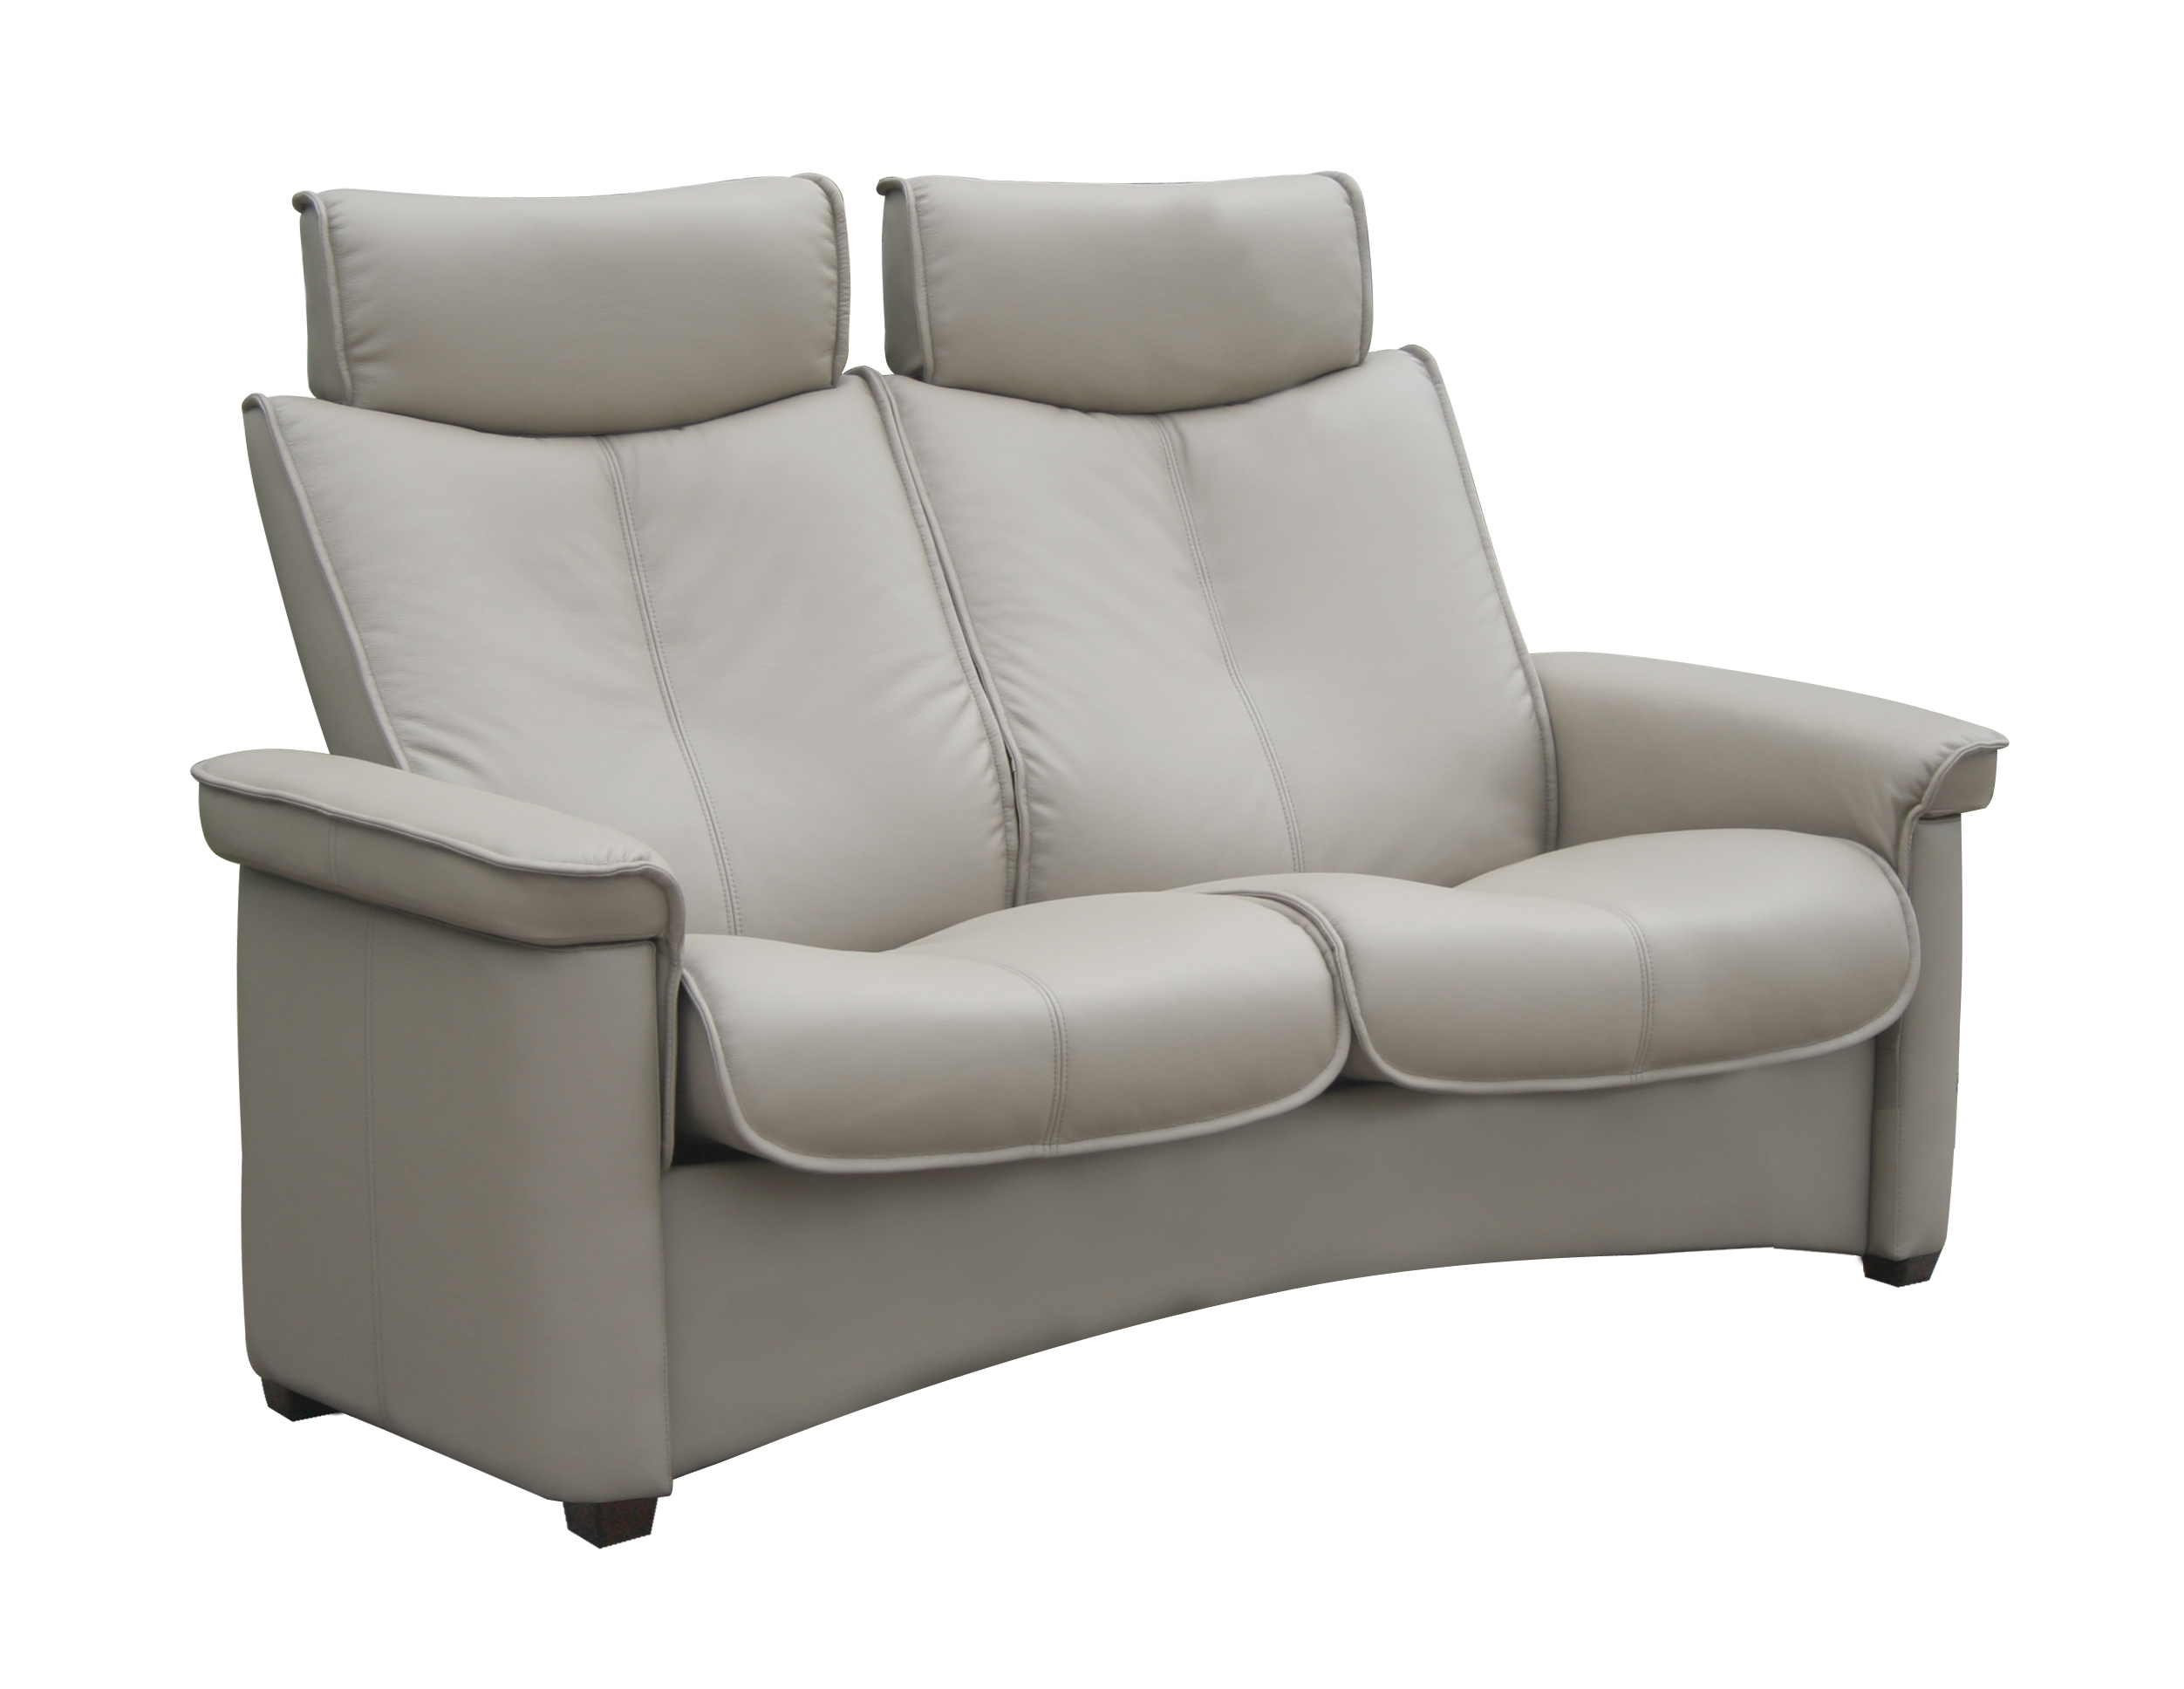 canap 2 places en cuir panama. Black Bedroom Furniture Sets. Home Design Ideas